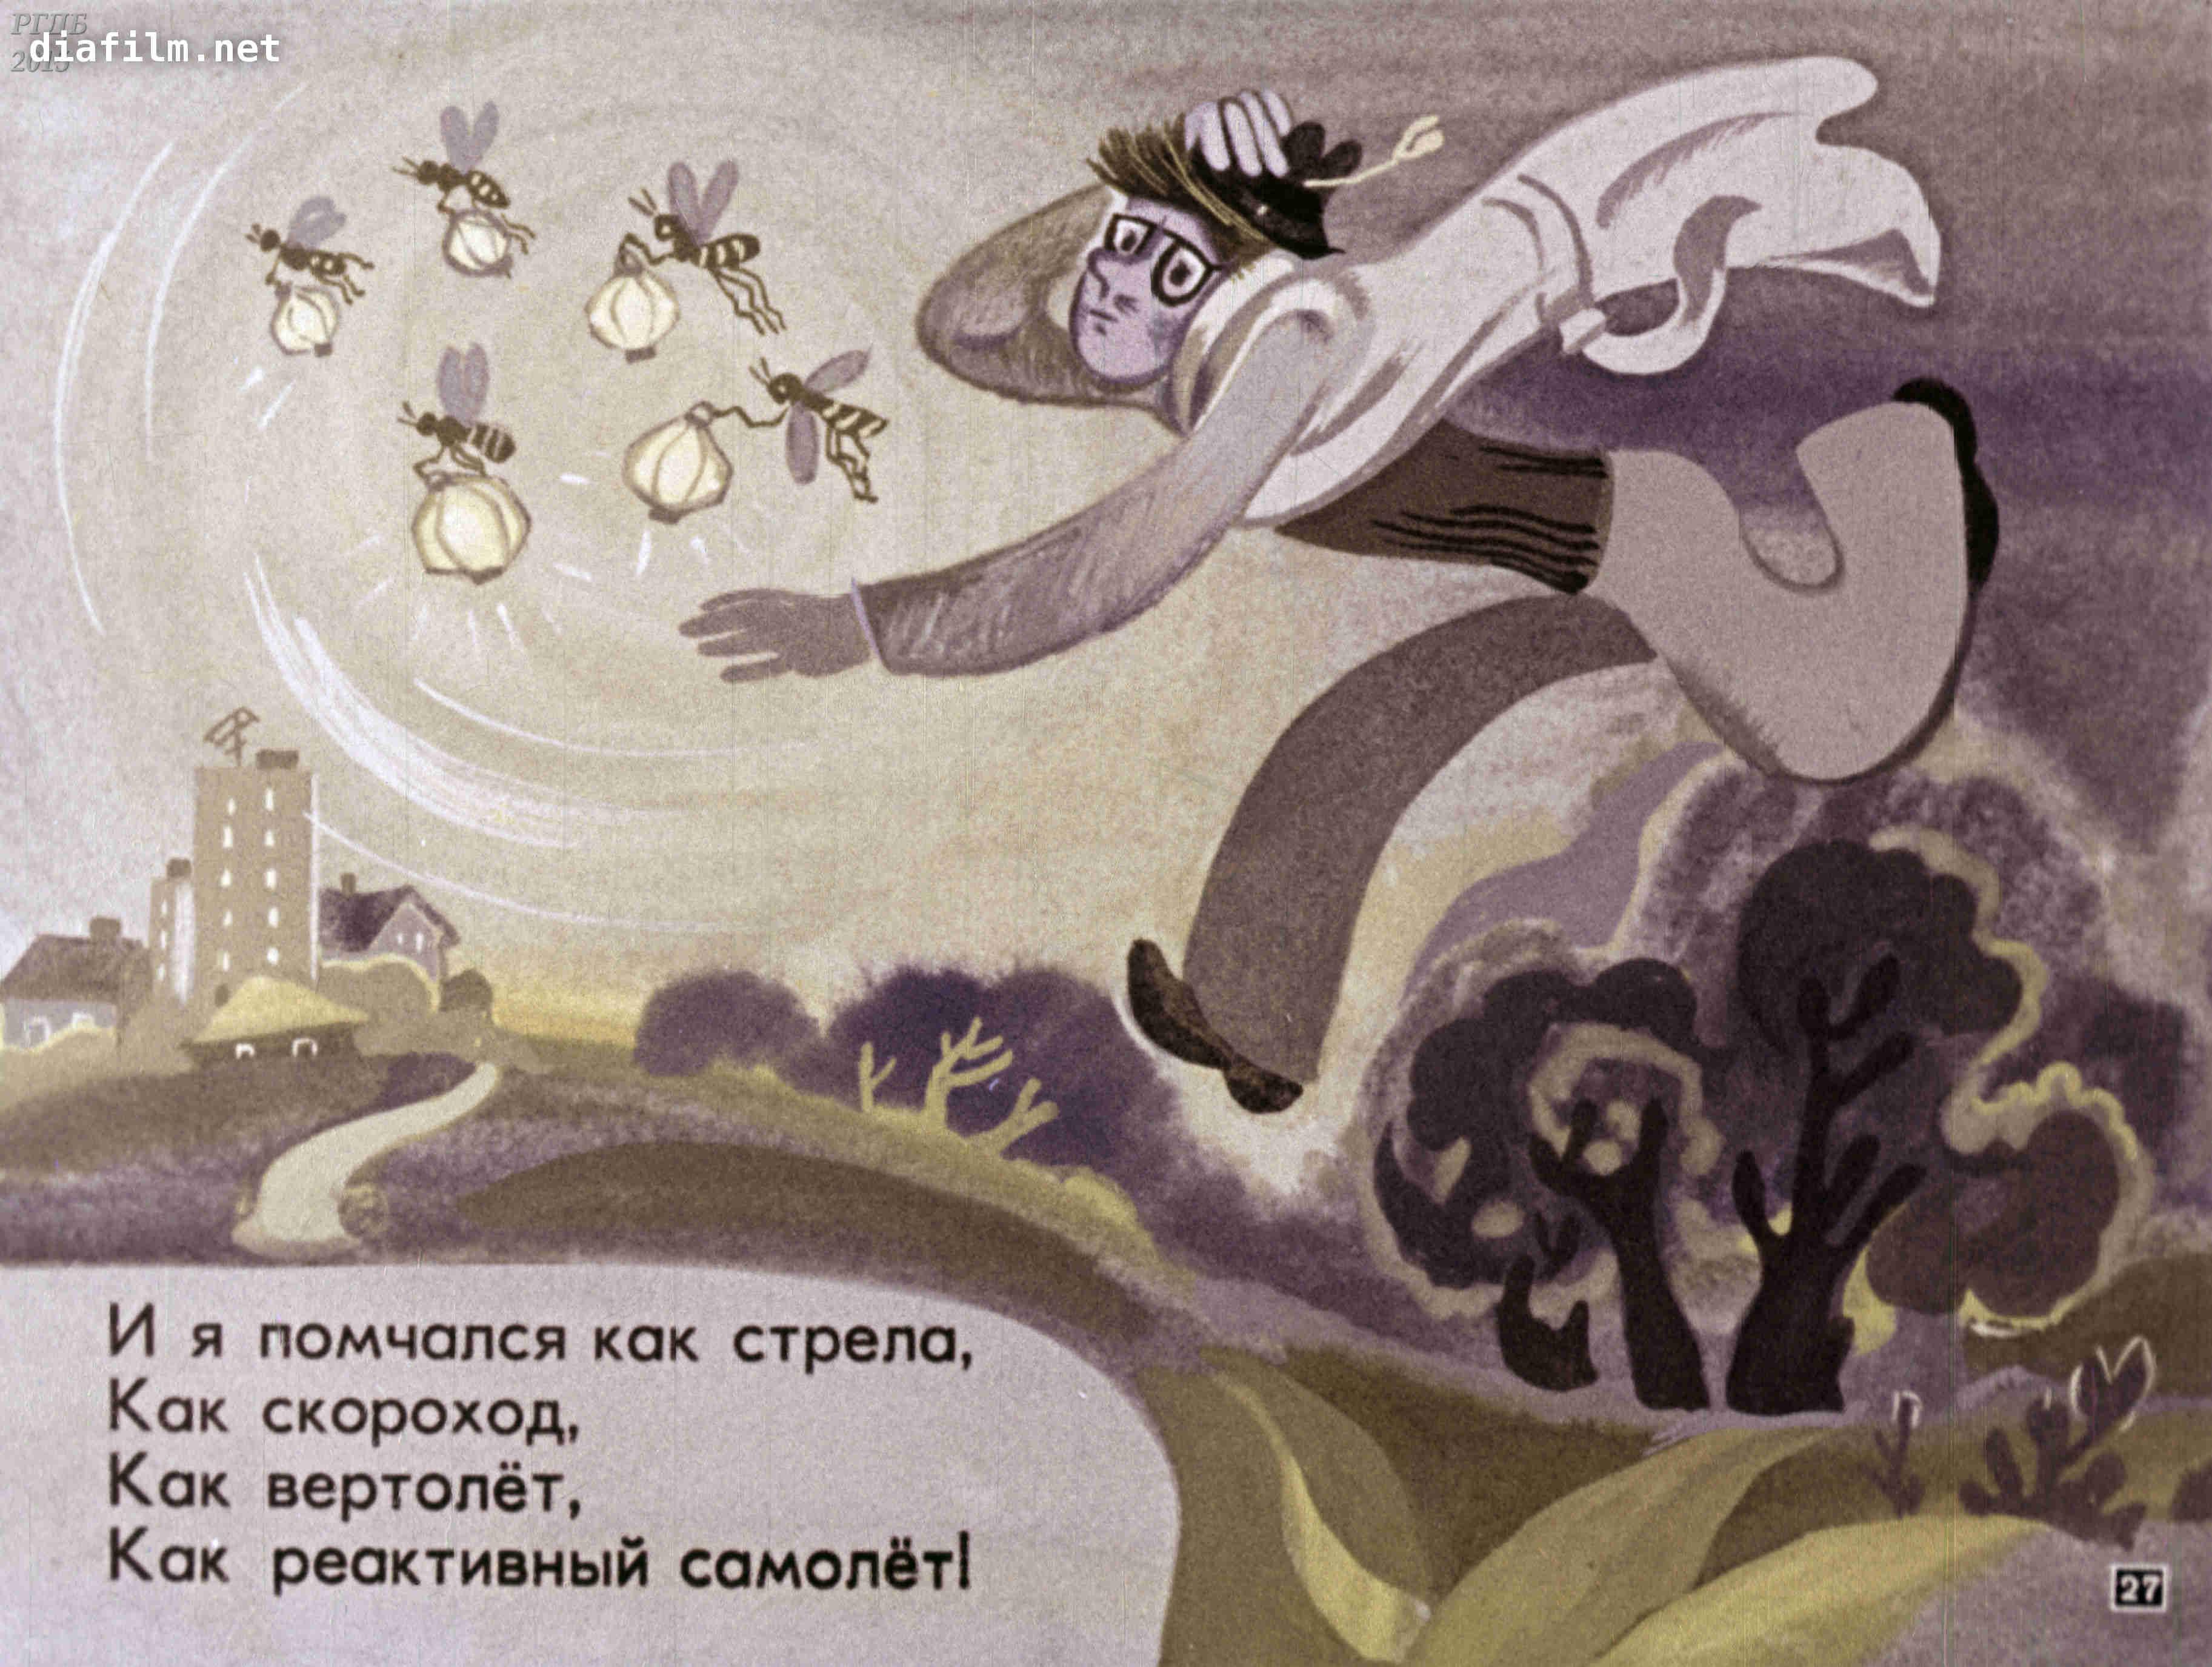 тем, ирина токмакова вечерняя сказка в картинках них